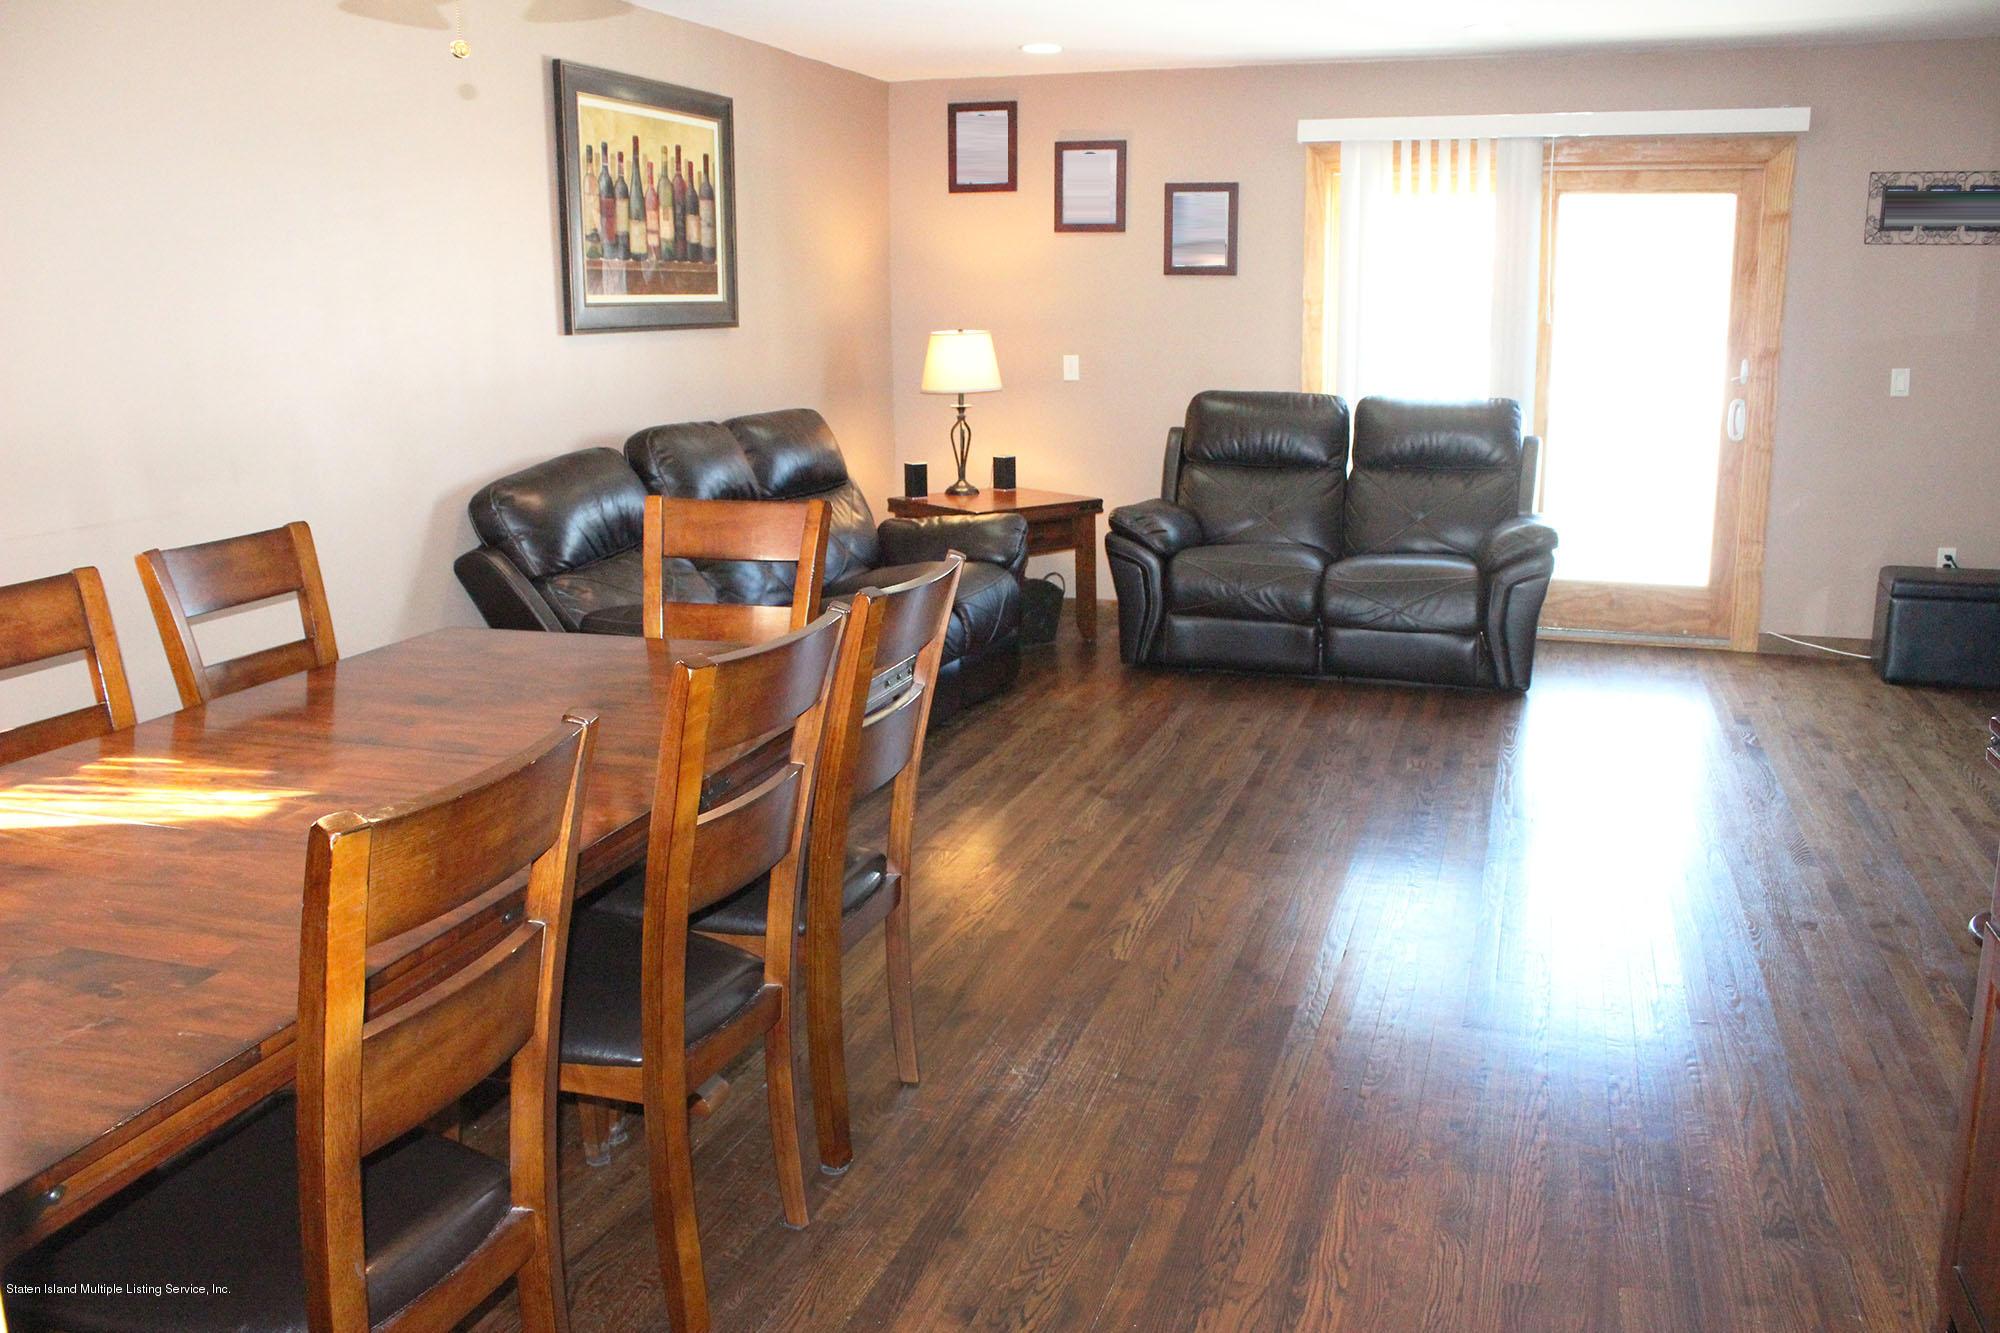 Single Family - Semi-Attached 97 Amber Street  Staten Island, NY 10306, MLS-1130203-5